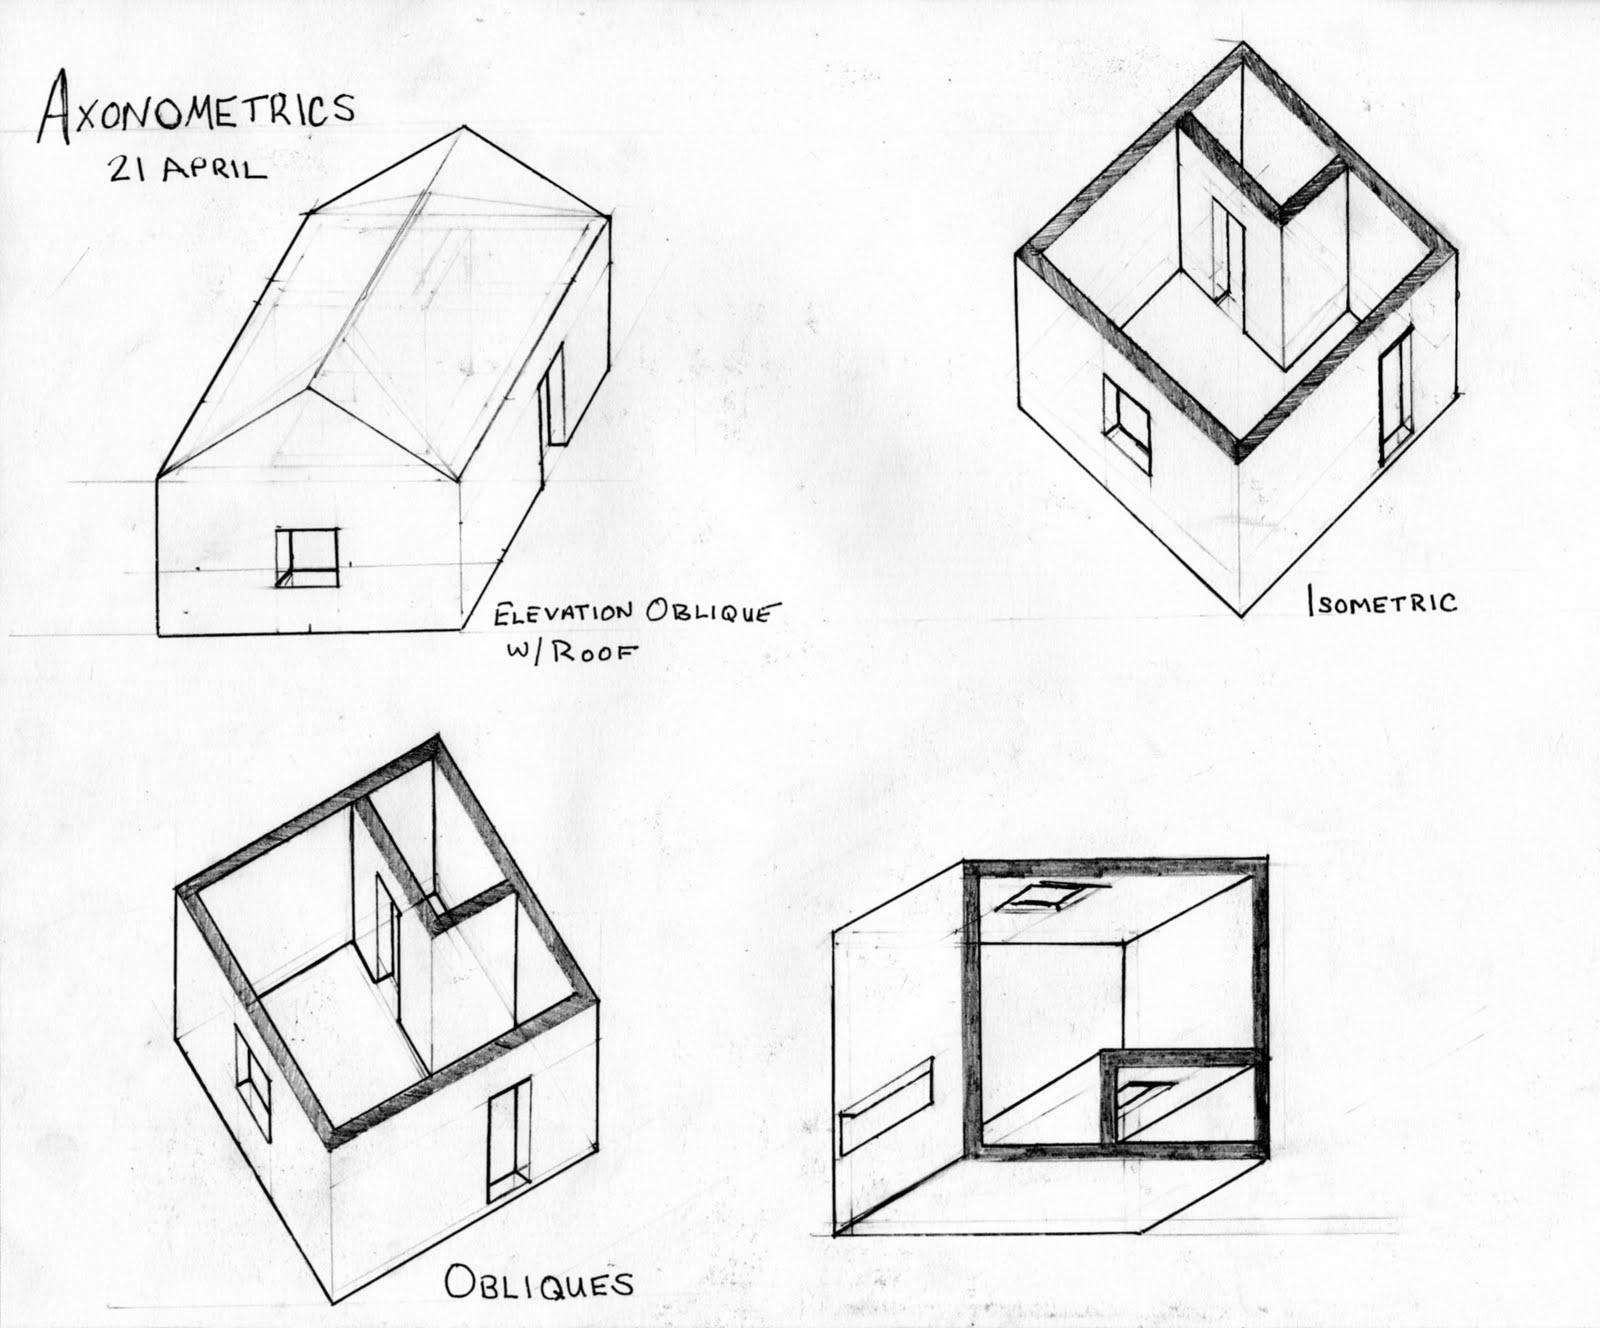 Chalfin Drawings Axonometrics